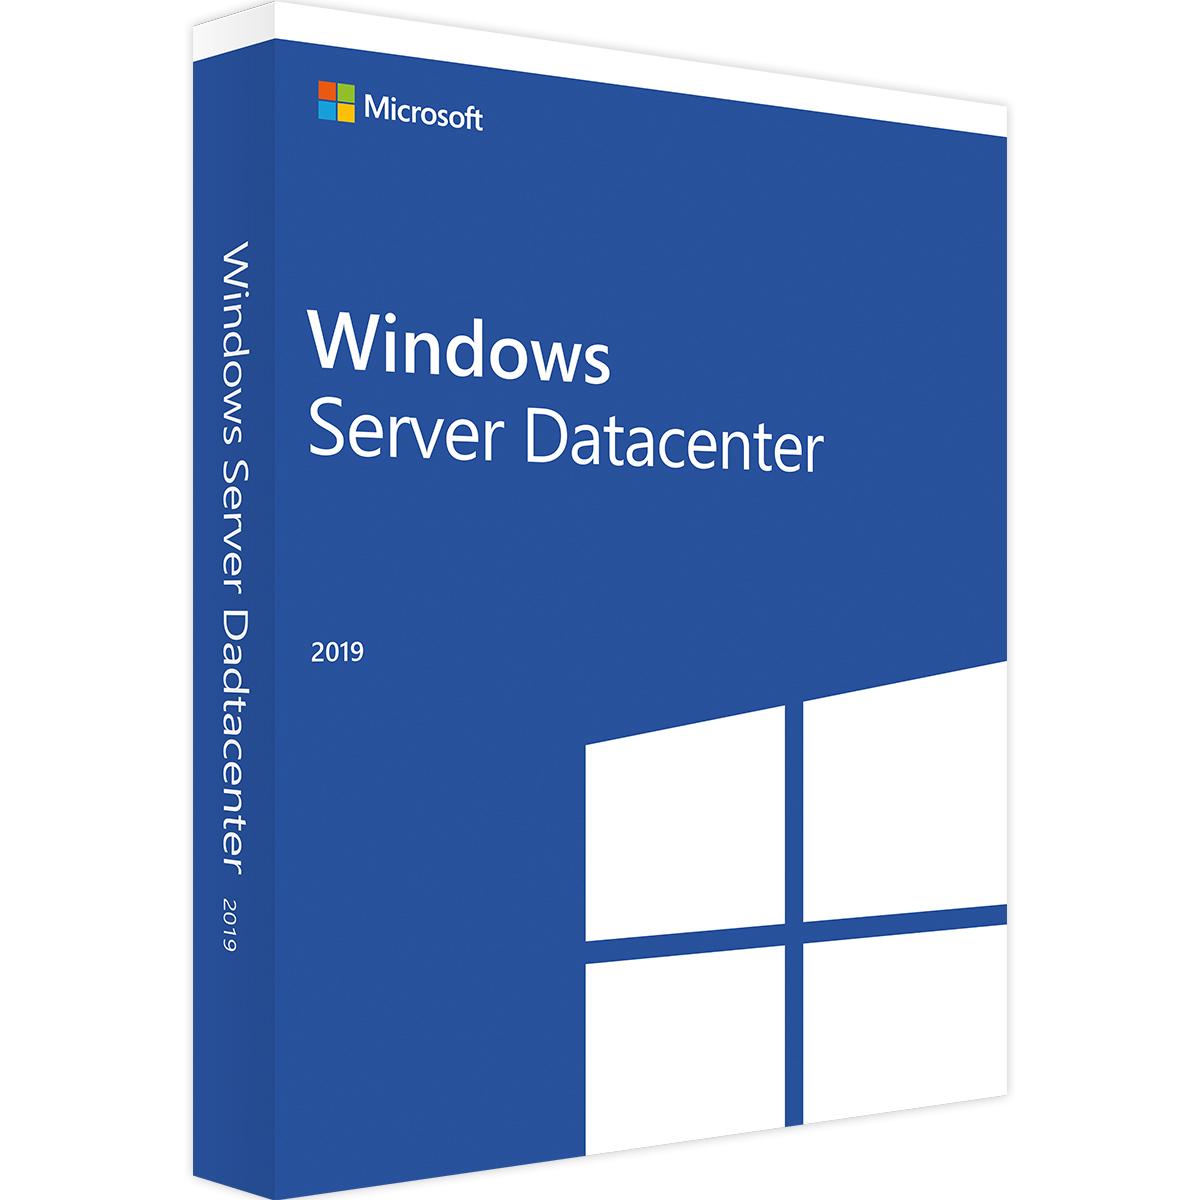 Windows Server 2019 Datacenter Microsoft Windows Server